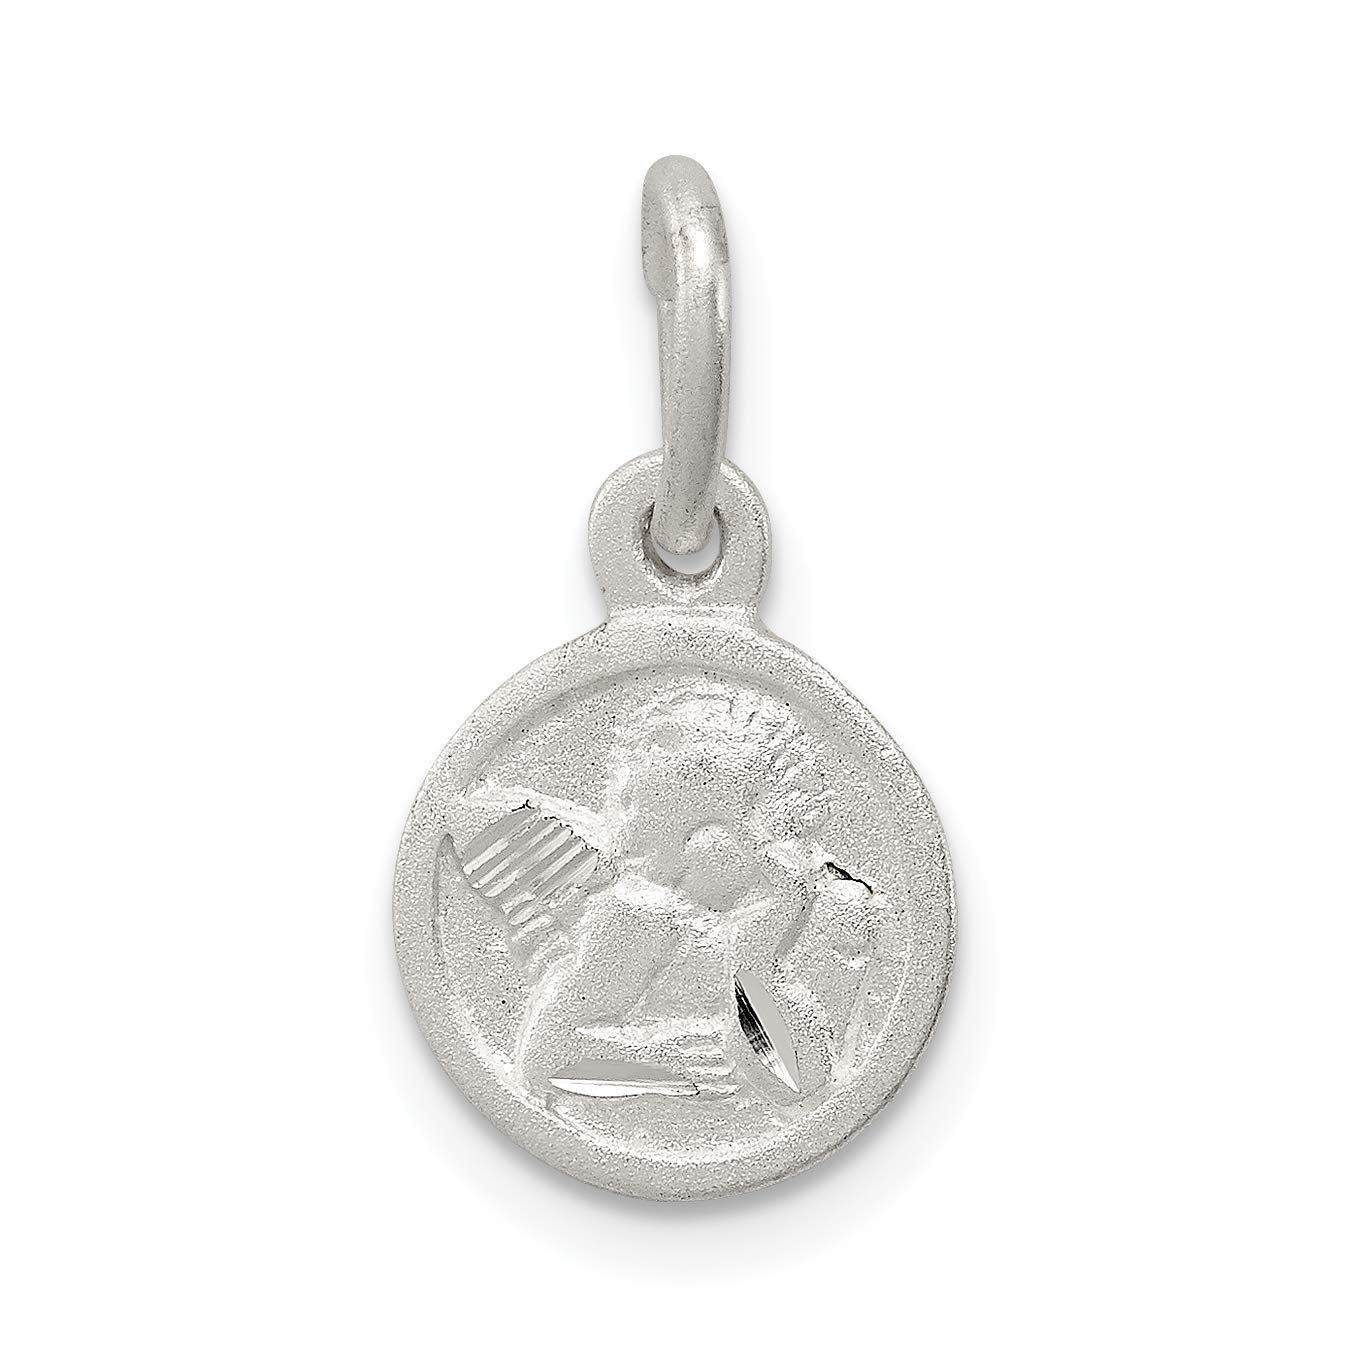 Cherub Angel Round Disc Shaped Charm in 925 Sterling Silver 19x10mm